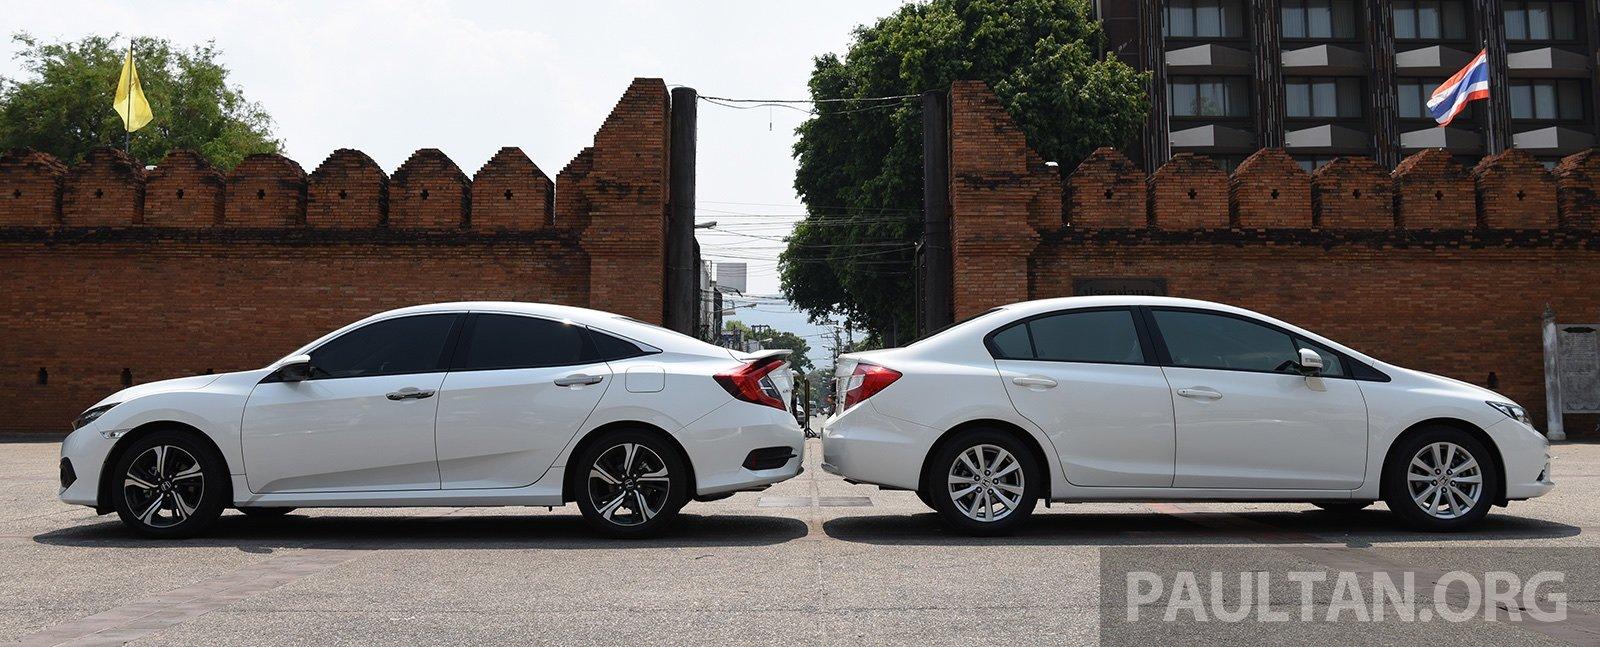 10Th Gen Civic >> GALLERY: Honda Civic – 10th-gen FC vs 9th-gen FB Paul Tan - Image 493040